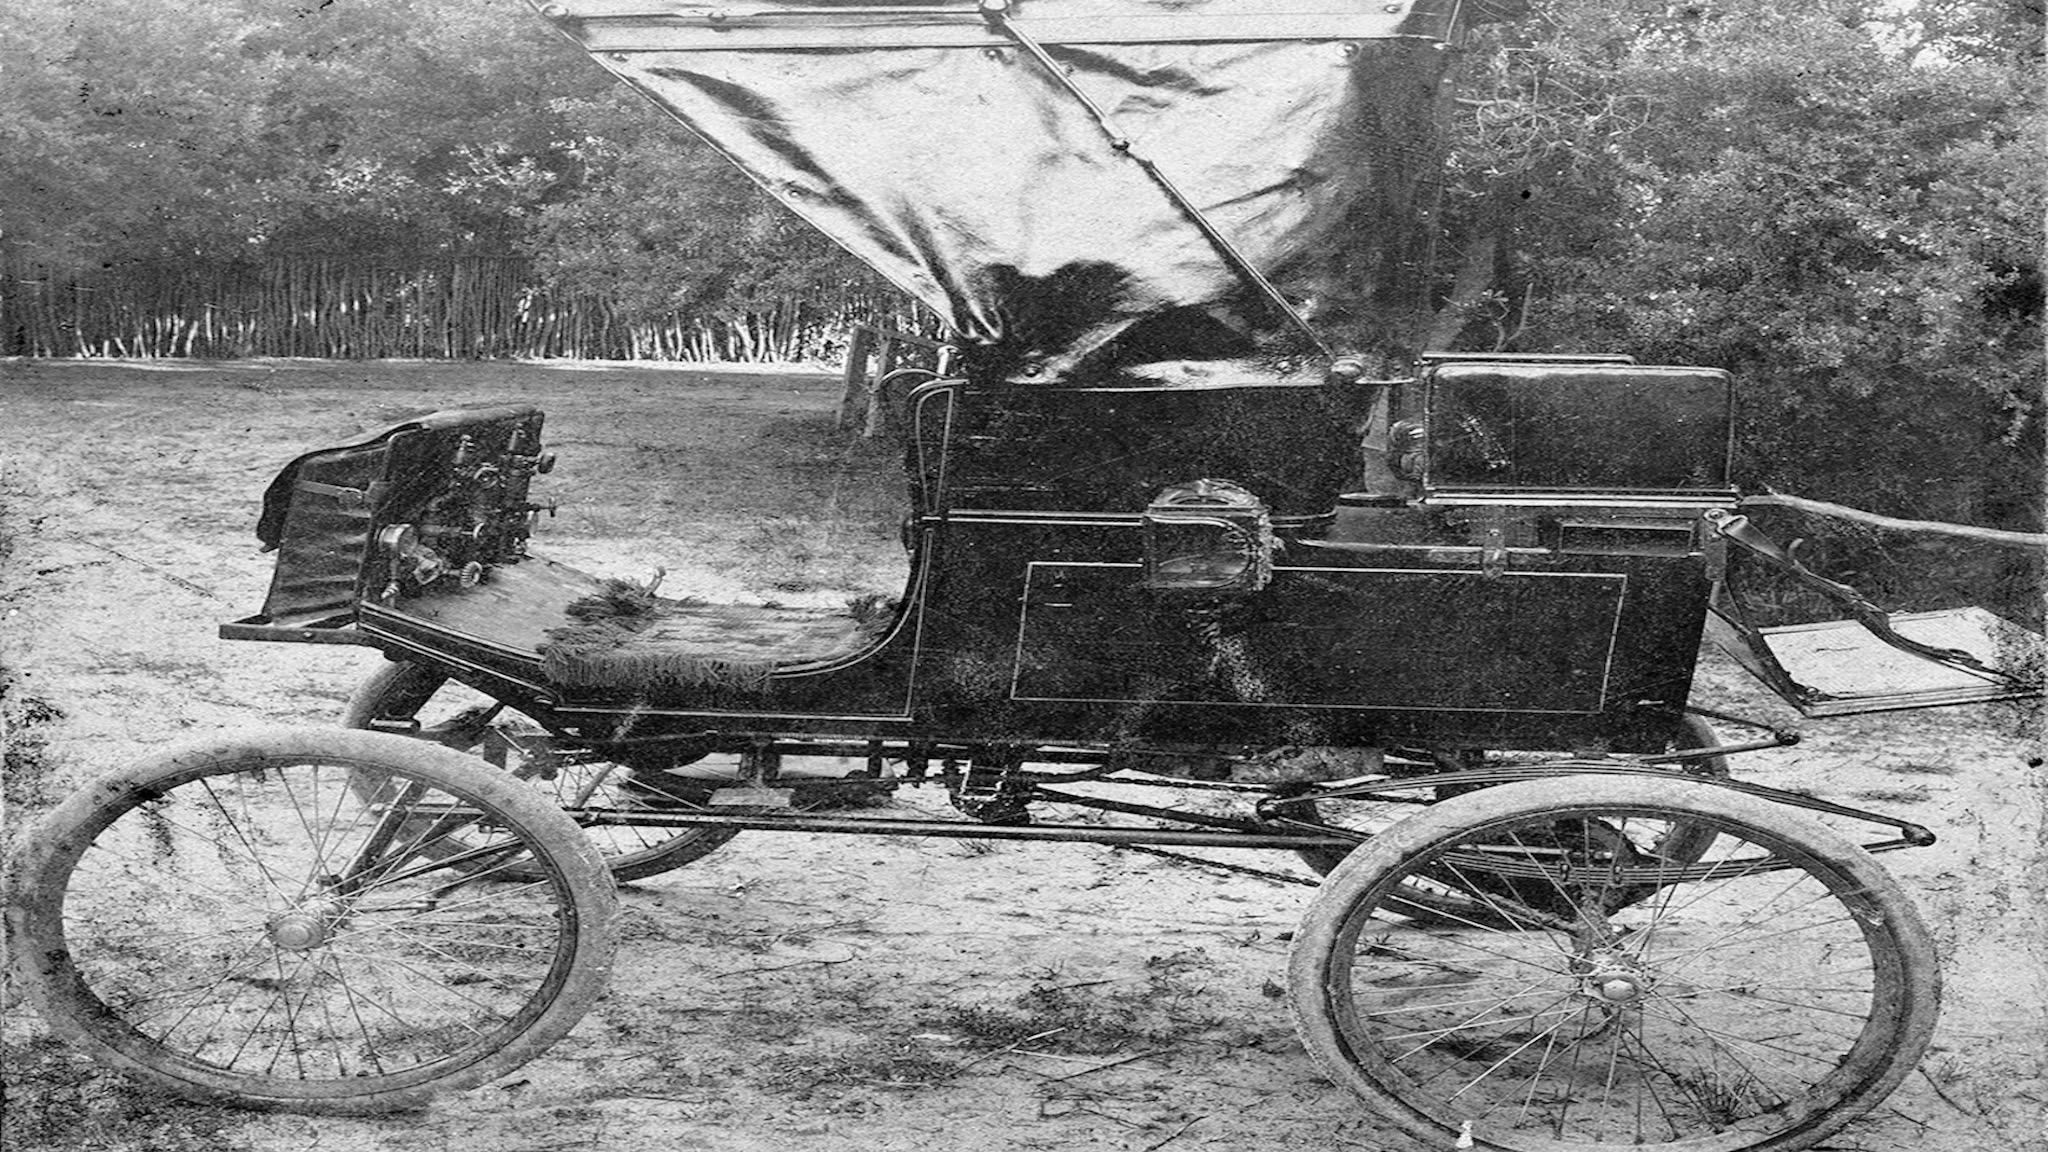 J.R Crooke's first motor vehicle, a Locomobile